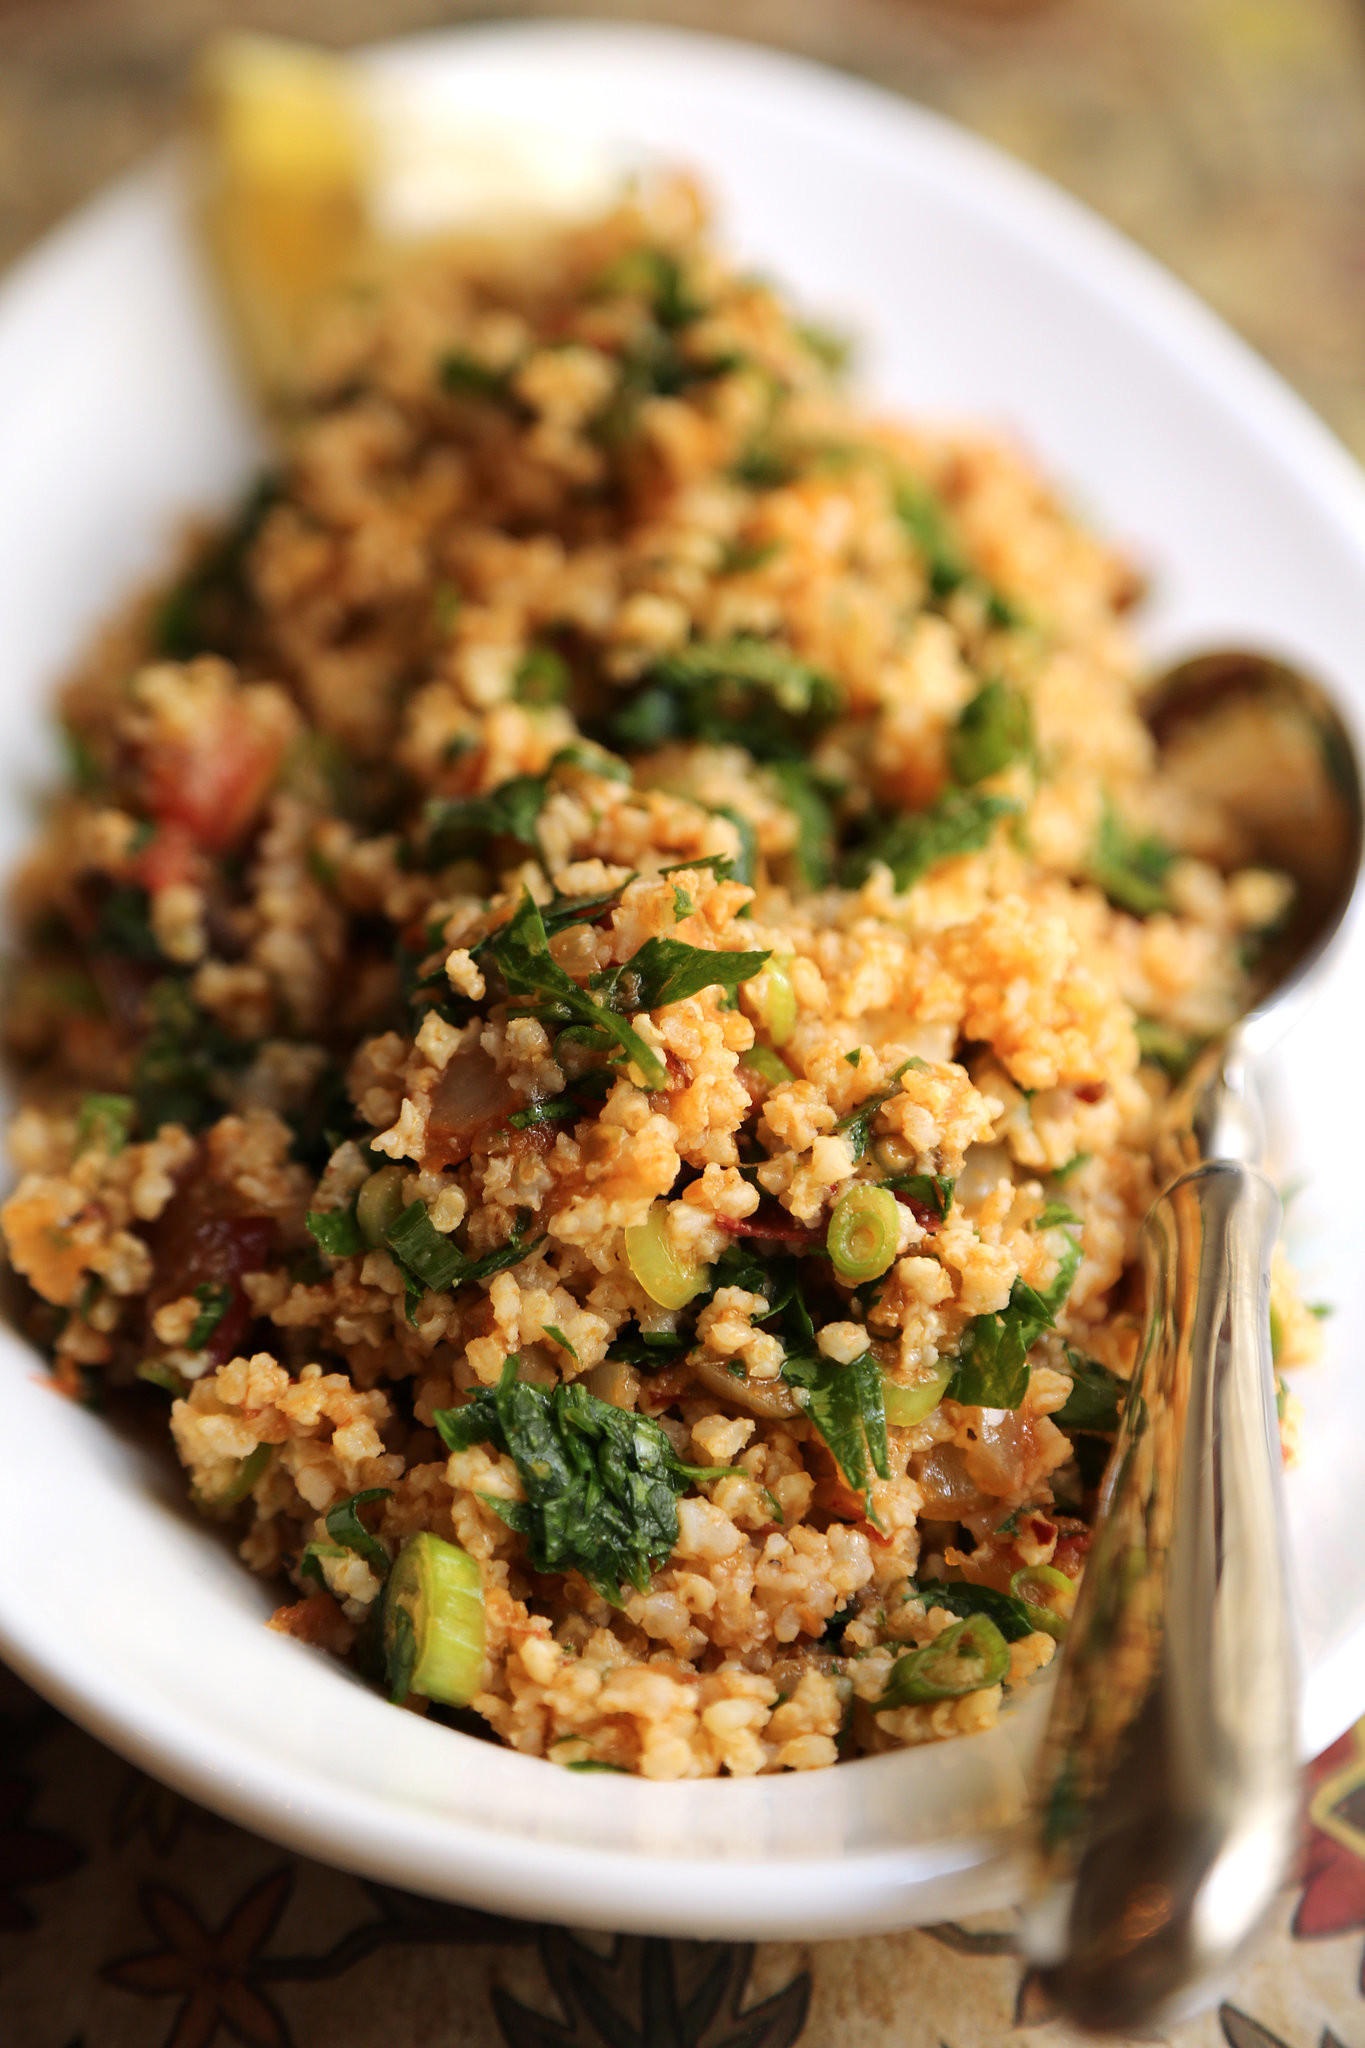 Easy Healthy Quinoa Recipes  Fast Easy Healthy Recipe For Quinoa Tabbouleh